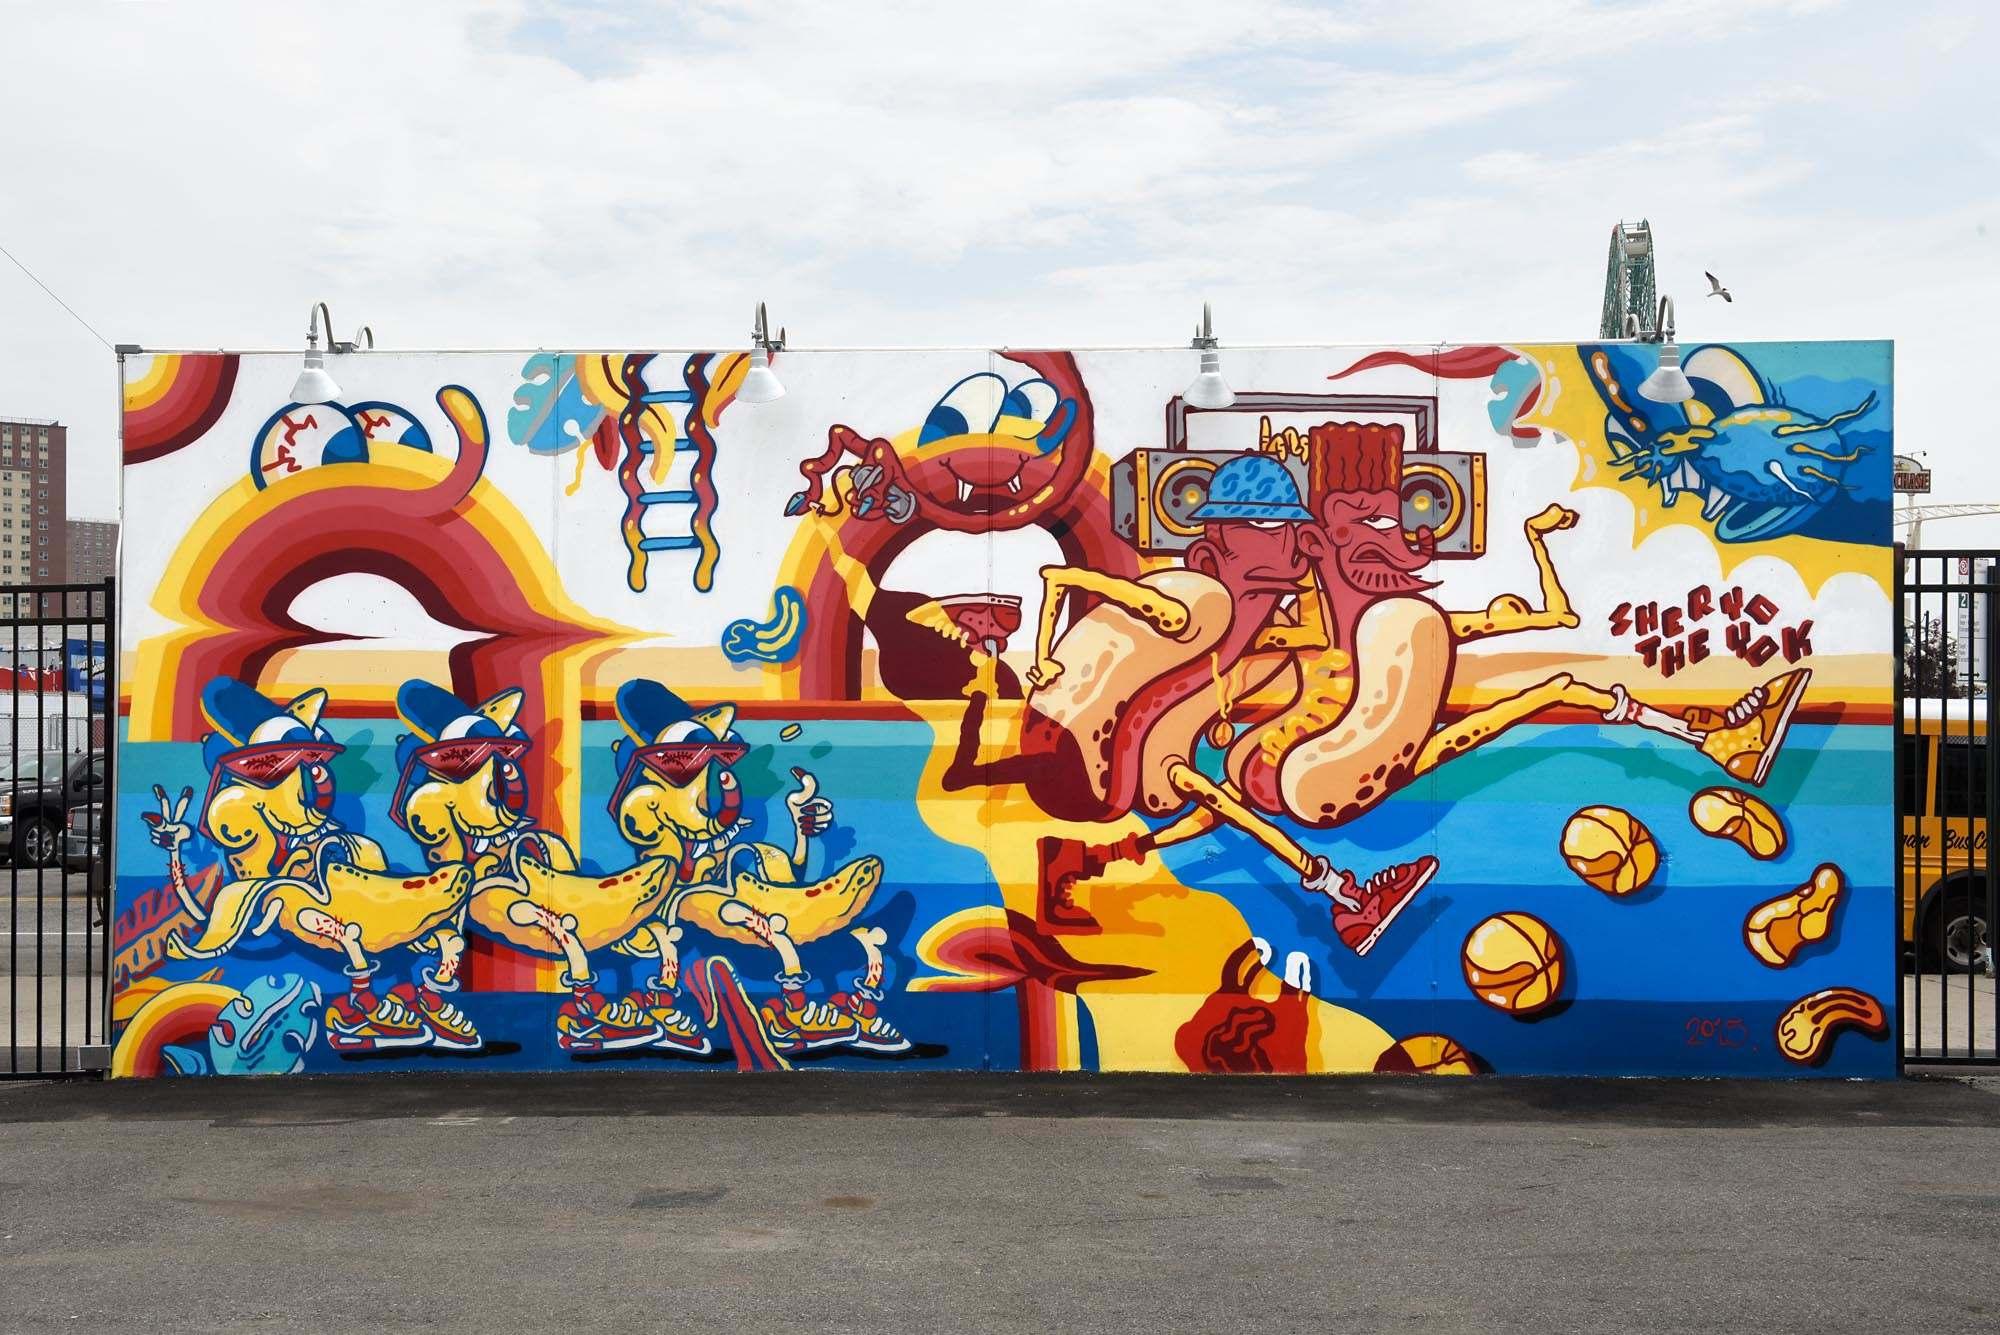 yok-sheryo-graffiti-cartoon-skateboard-17